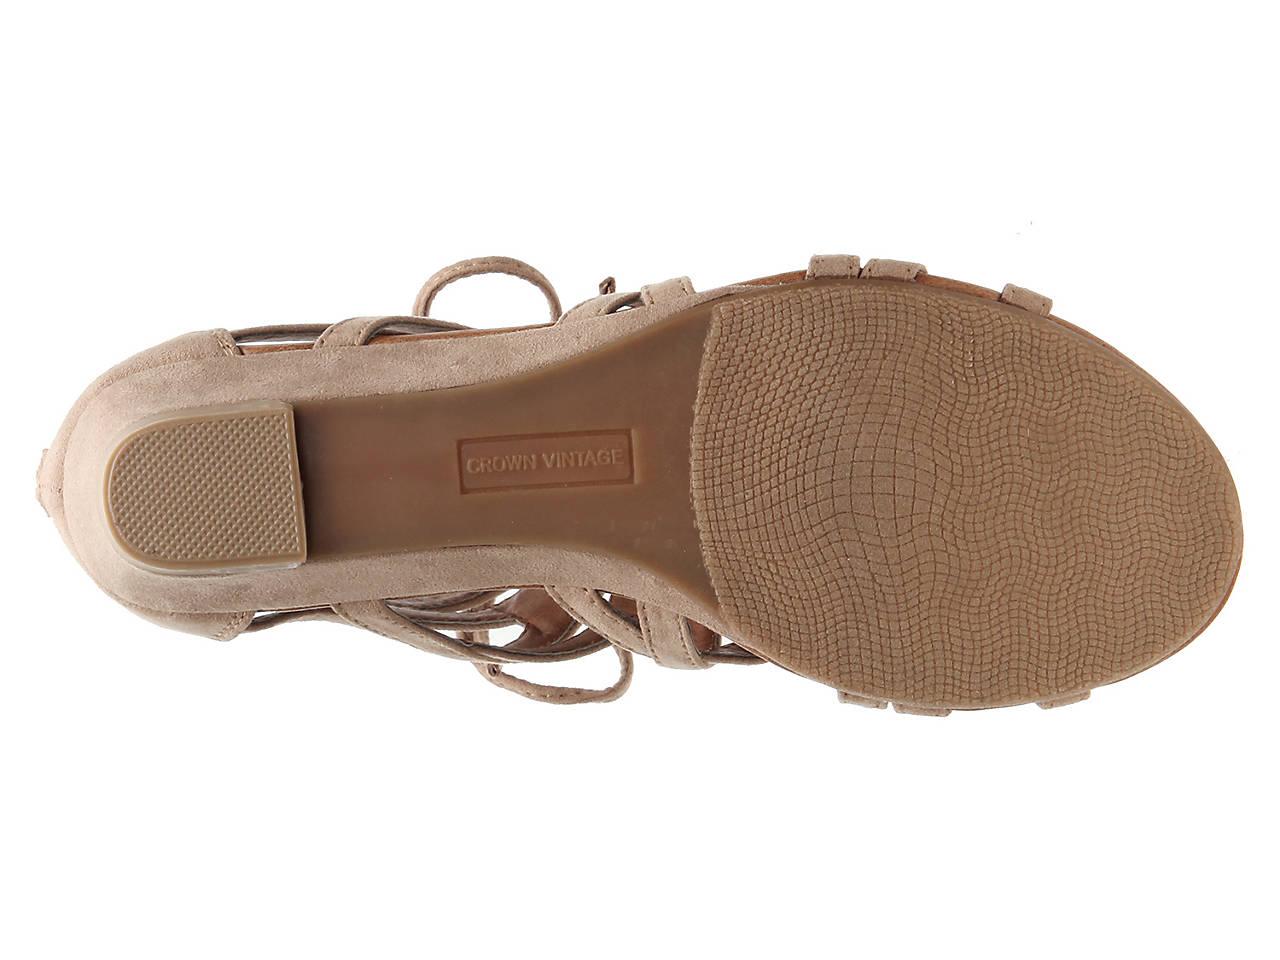 f1d33b526d1 Crown Vintage Sarah Wedge Gladiator Sandal Women s Shoes